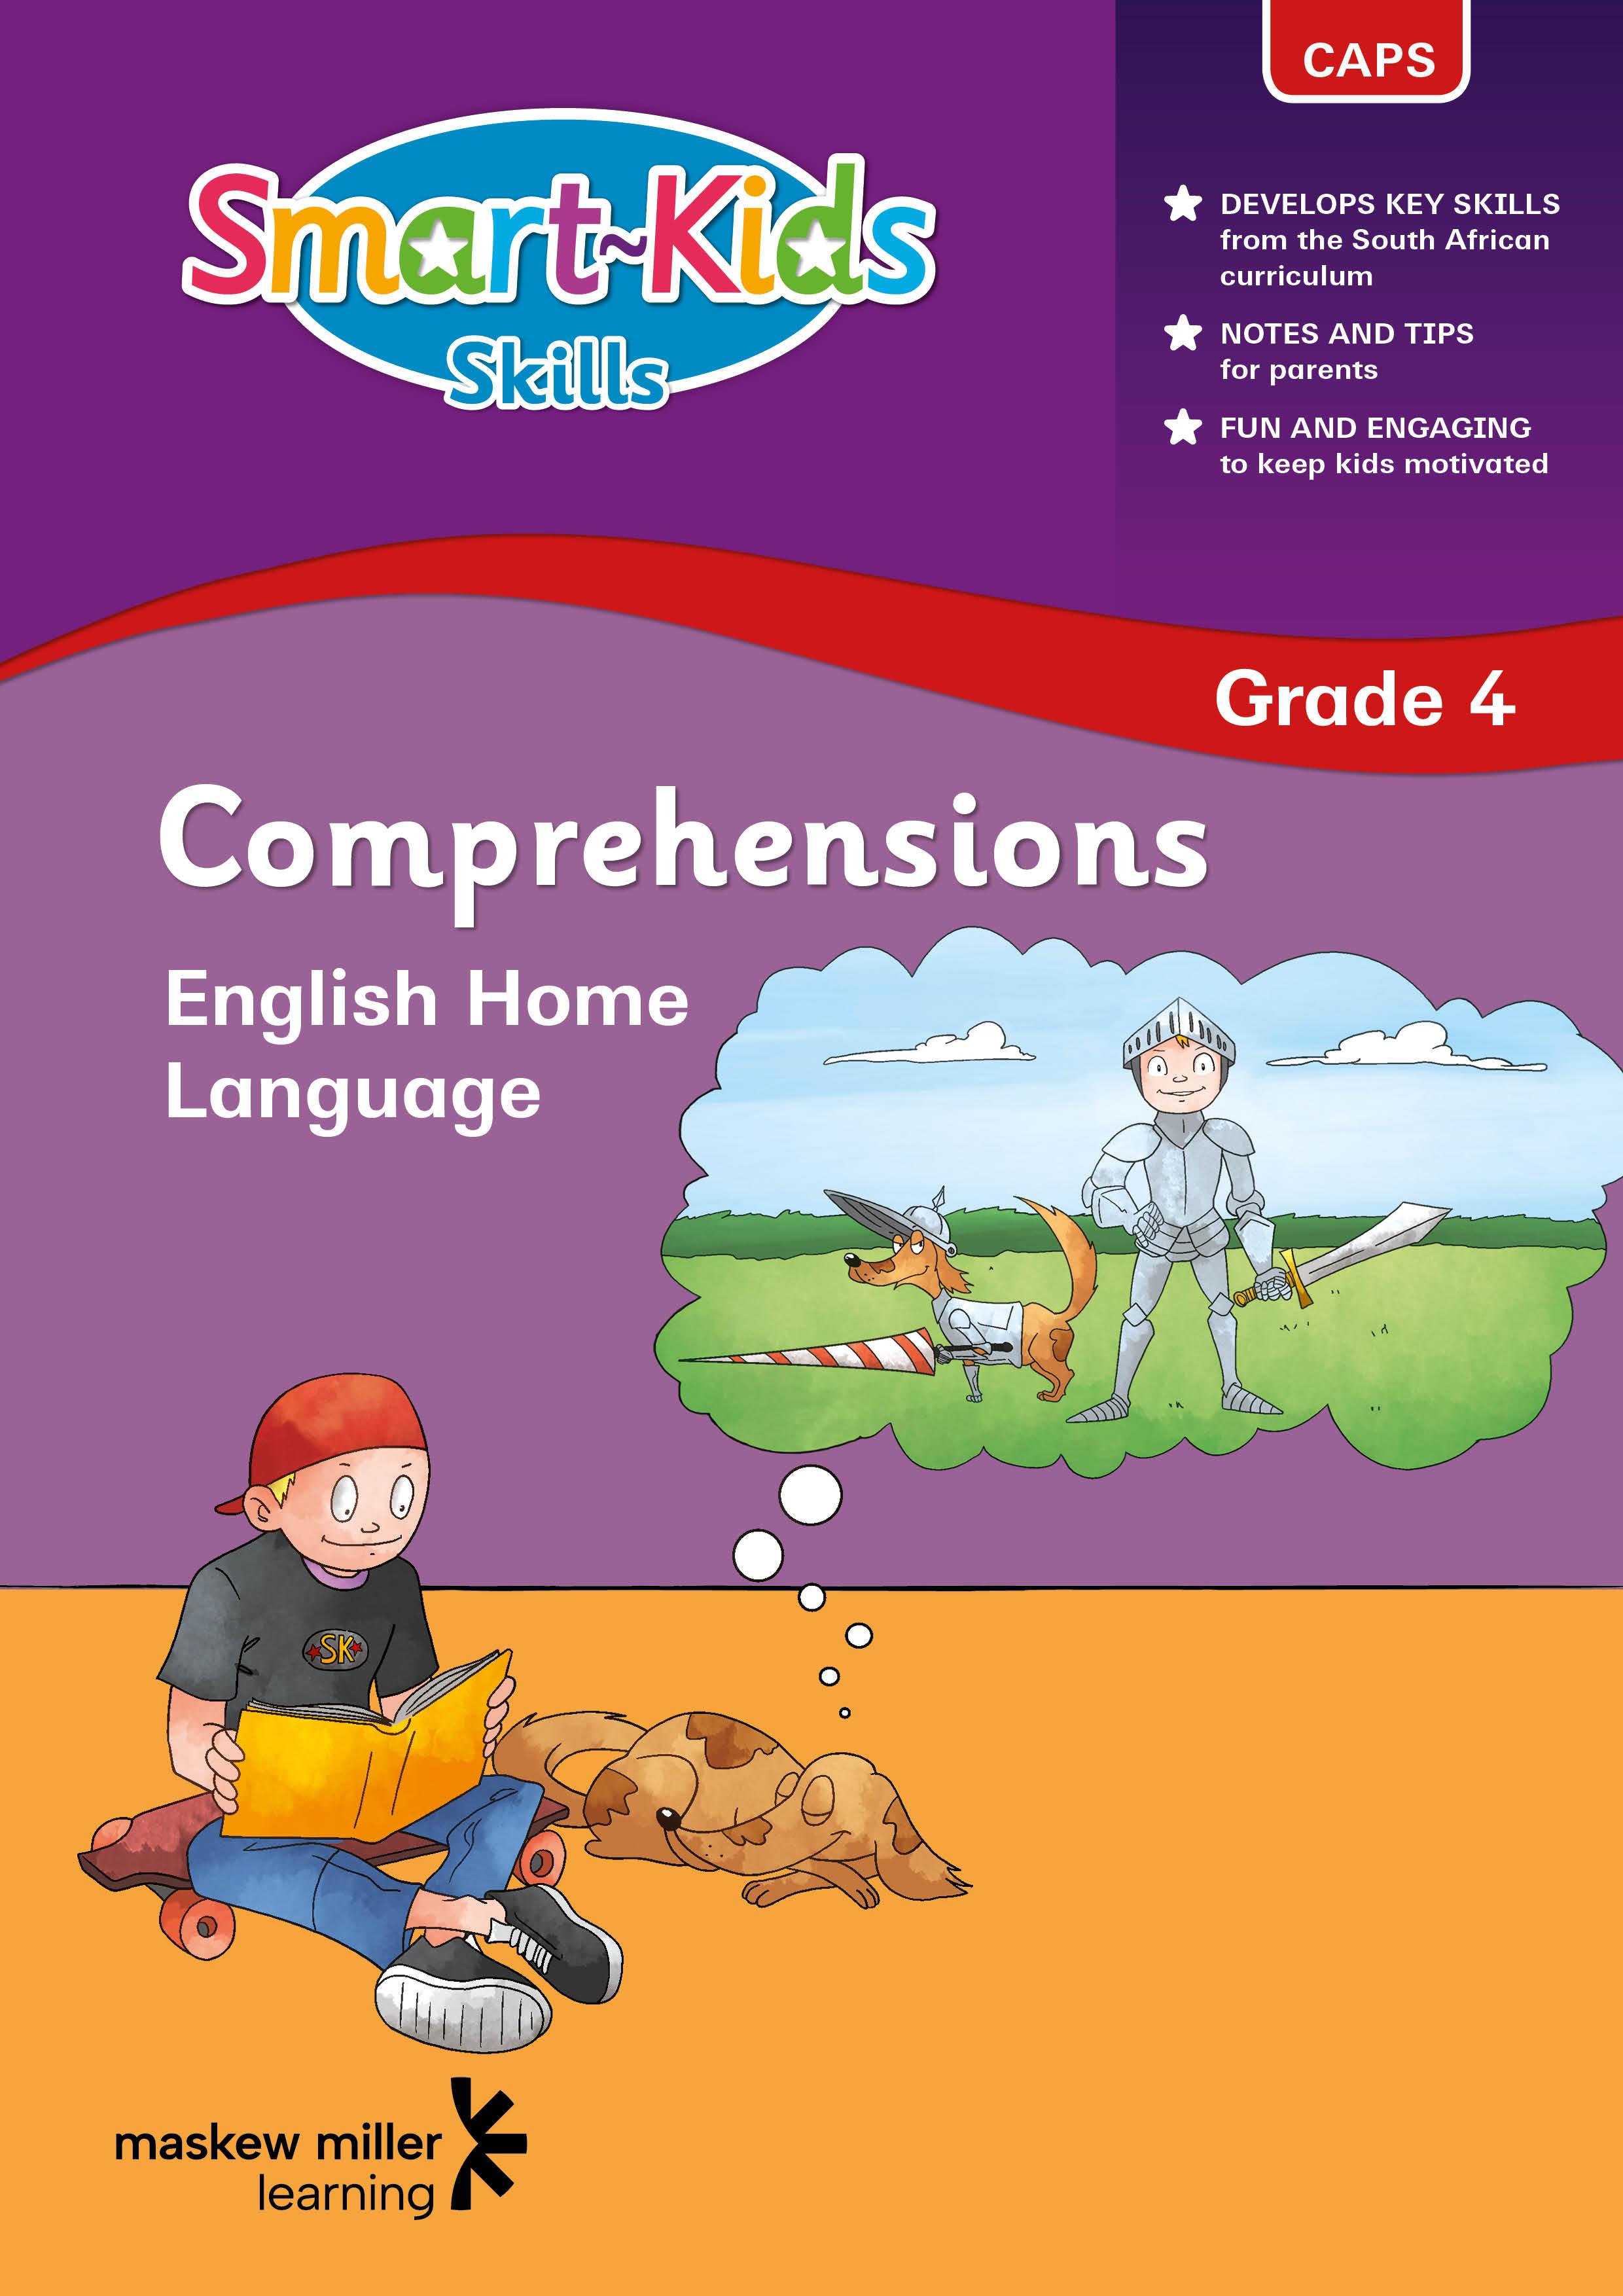 Smart-Kids Skills: Comprehensions: Grade 4